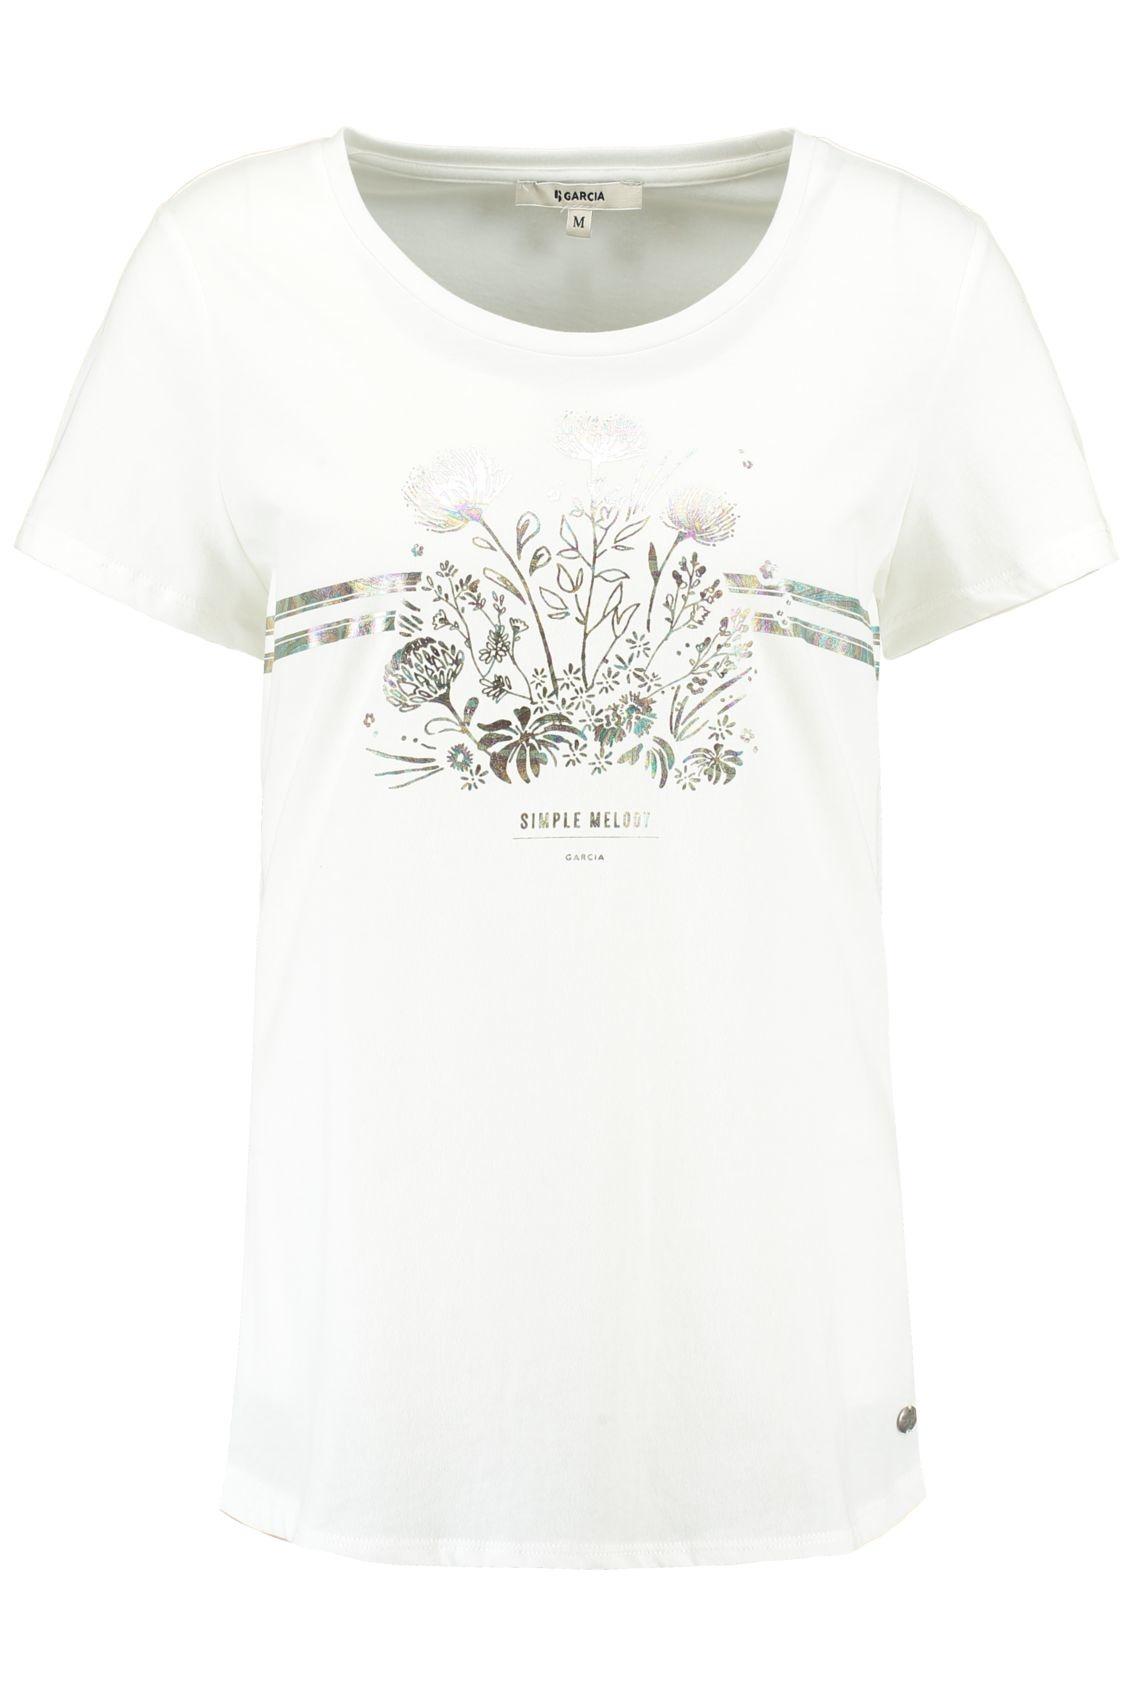 Garcia T-Shirt simple melody